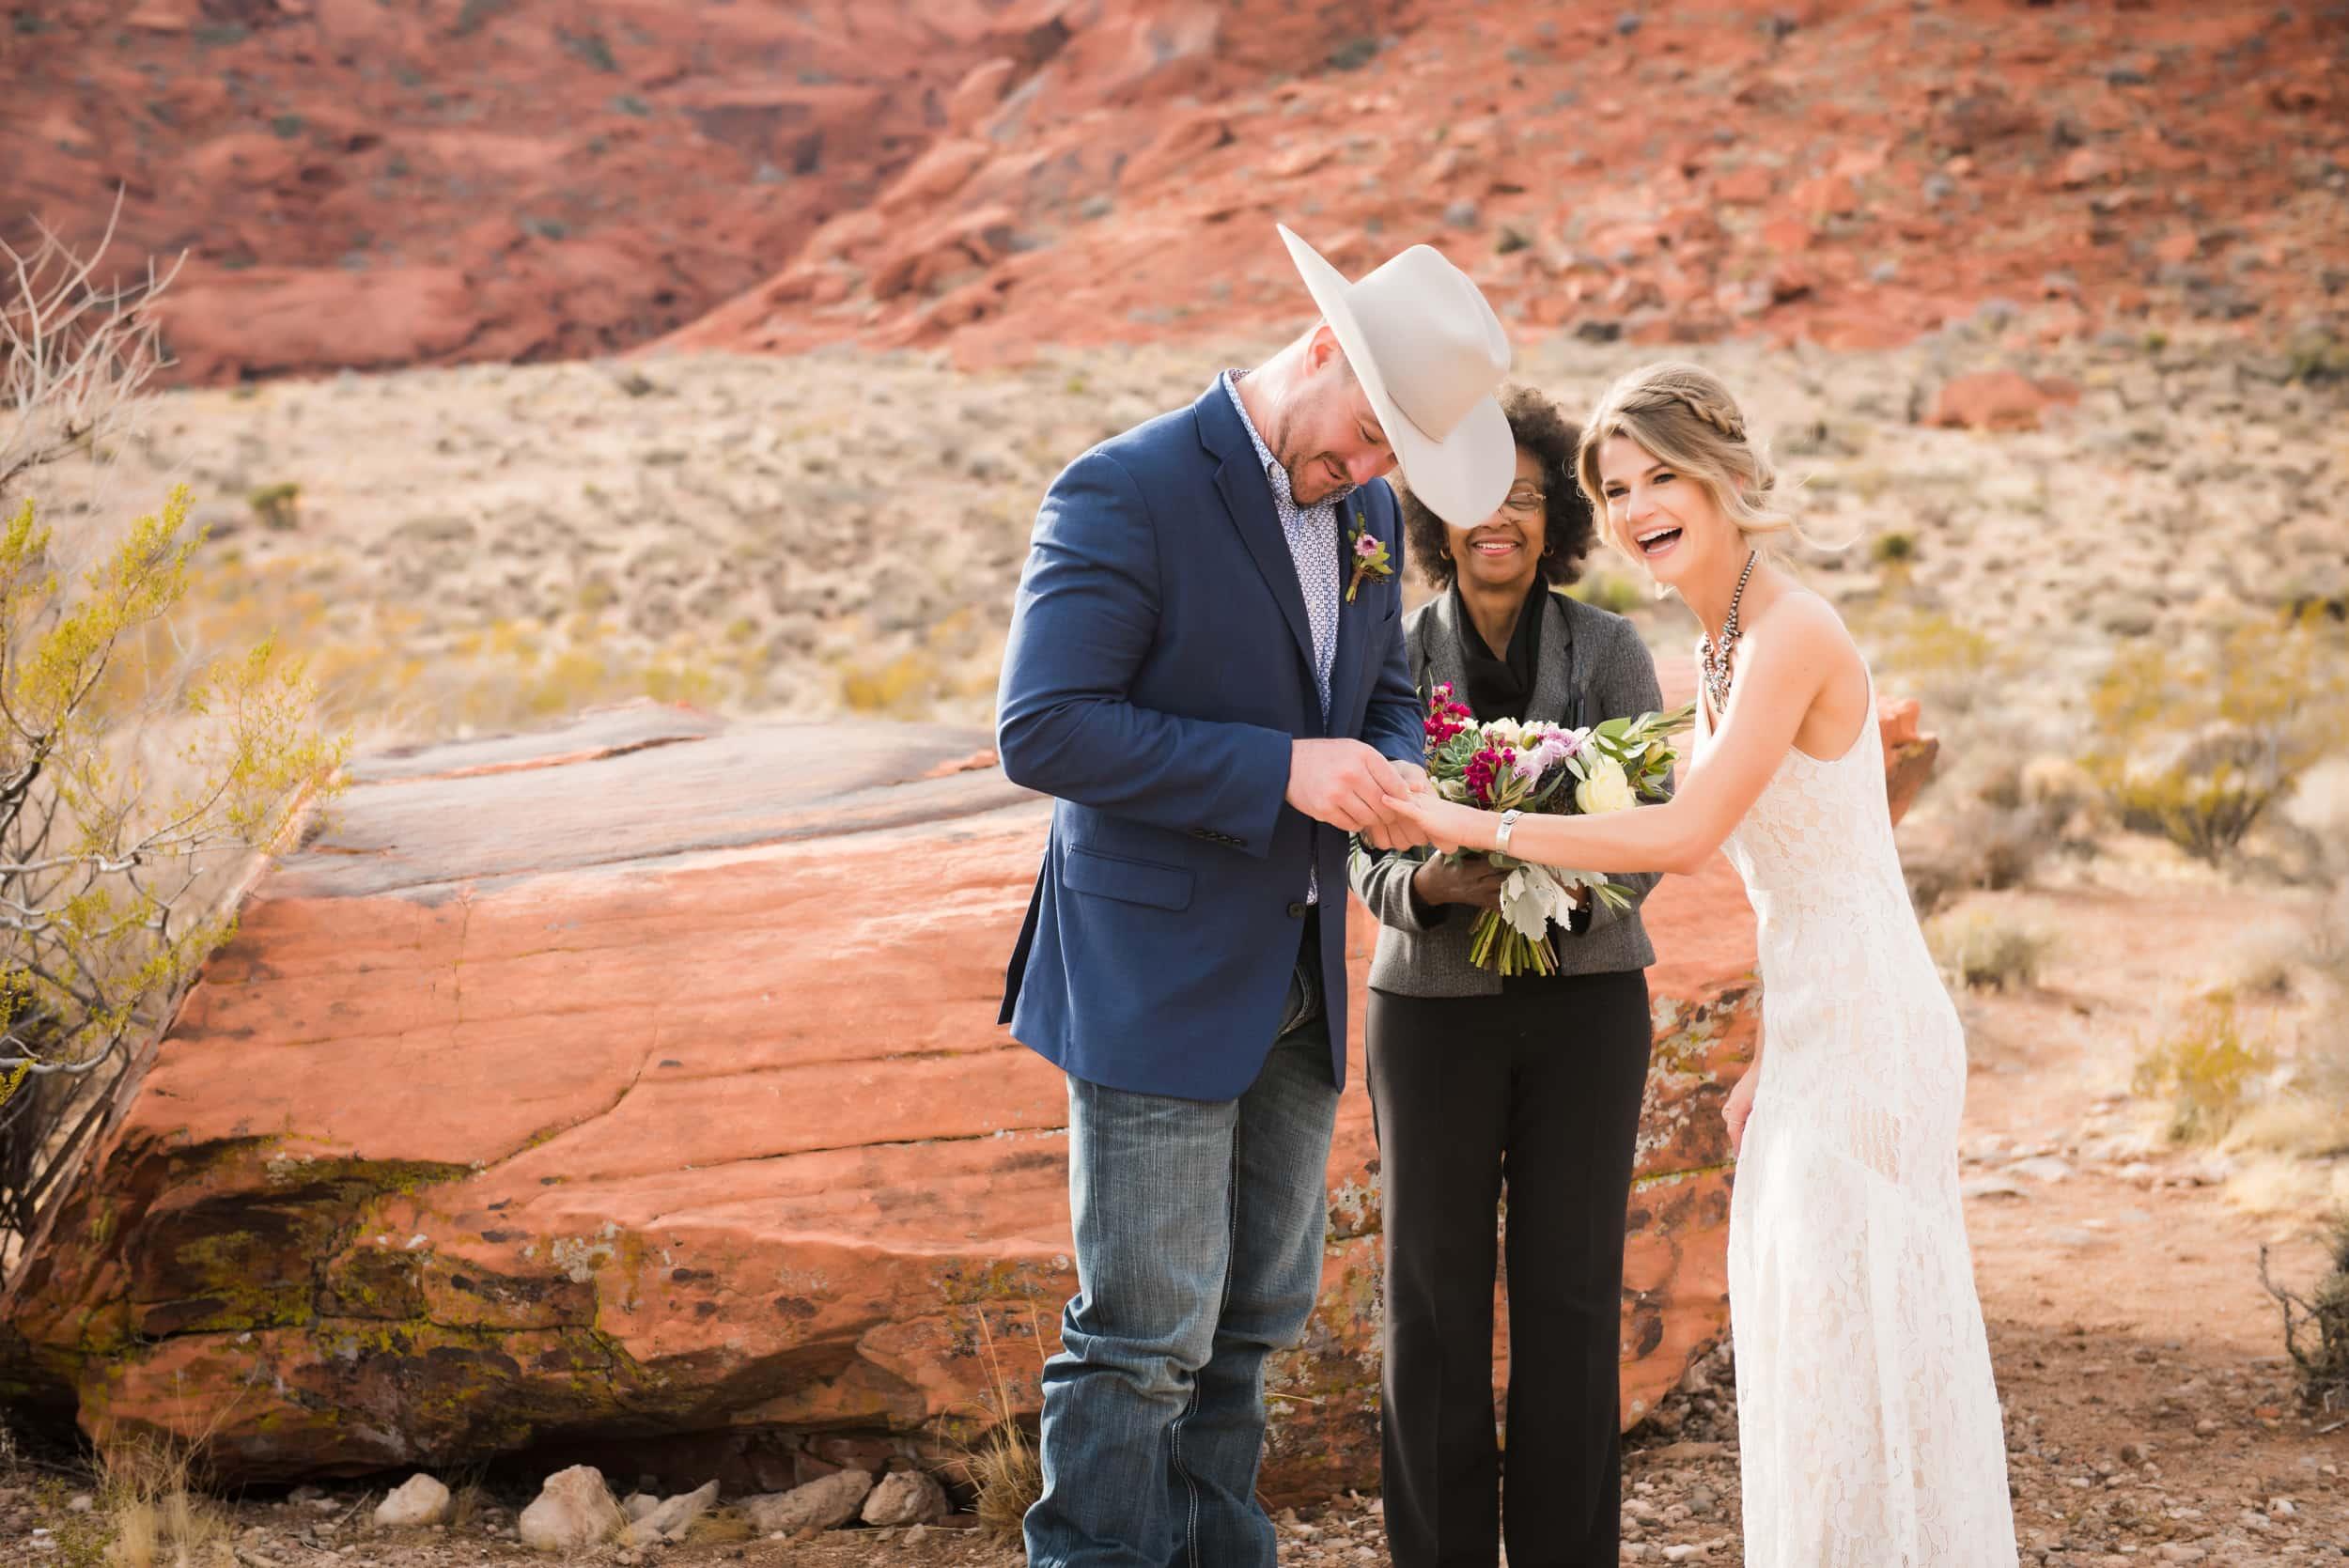 Western Wedding & Elopement Packages